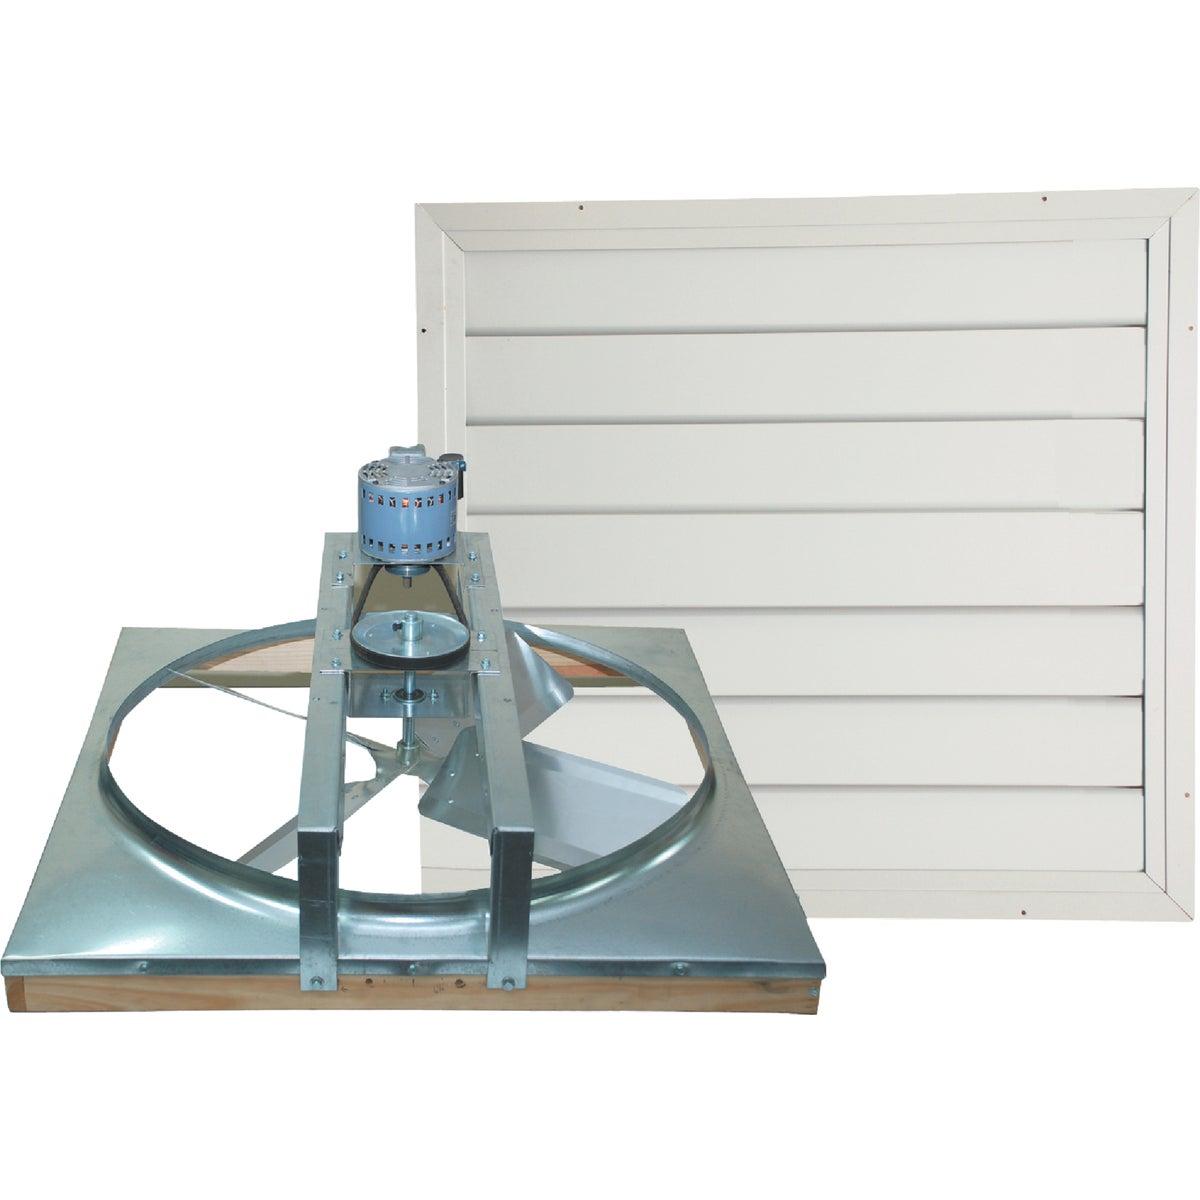 Ventamatic Belt Drive Whole House Fan With Automatic Shutter, CX30BD2SPD